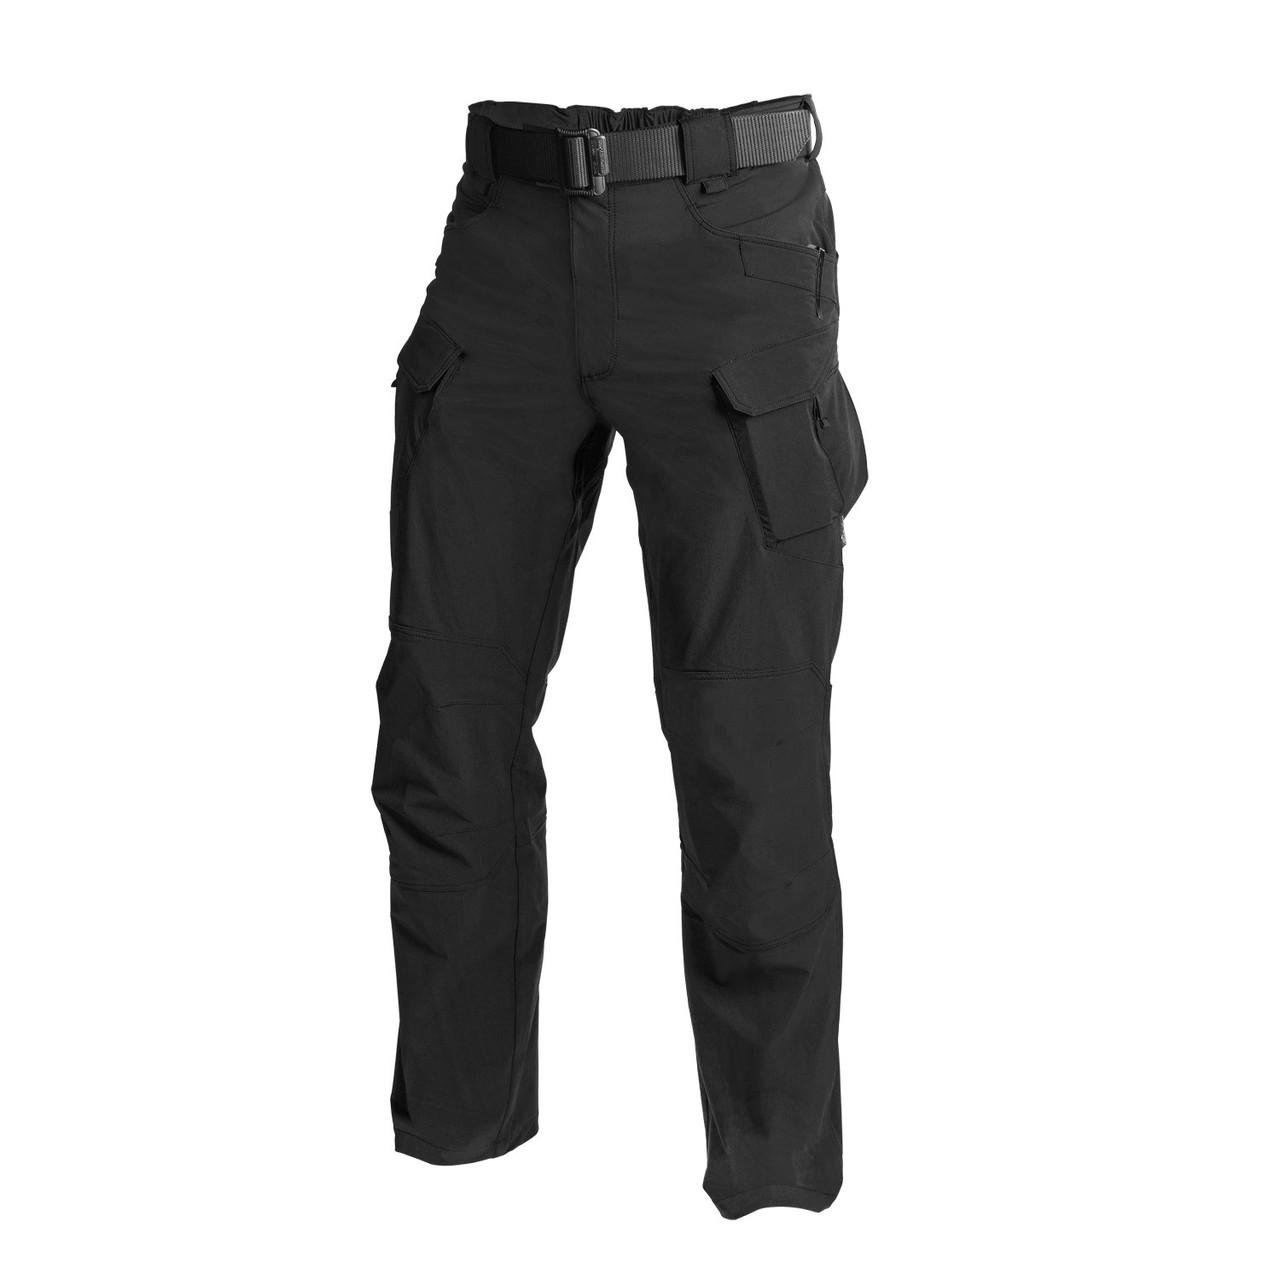 Штани тактичні Helikon - Tex, Outdoor Tactical Pants®. Новий товар. L, Black